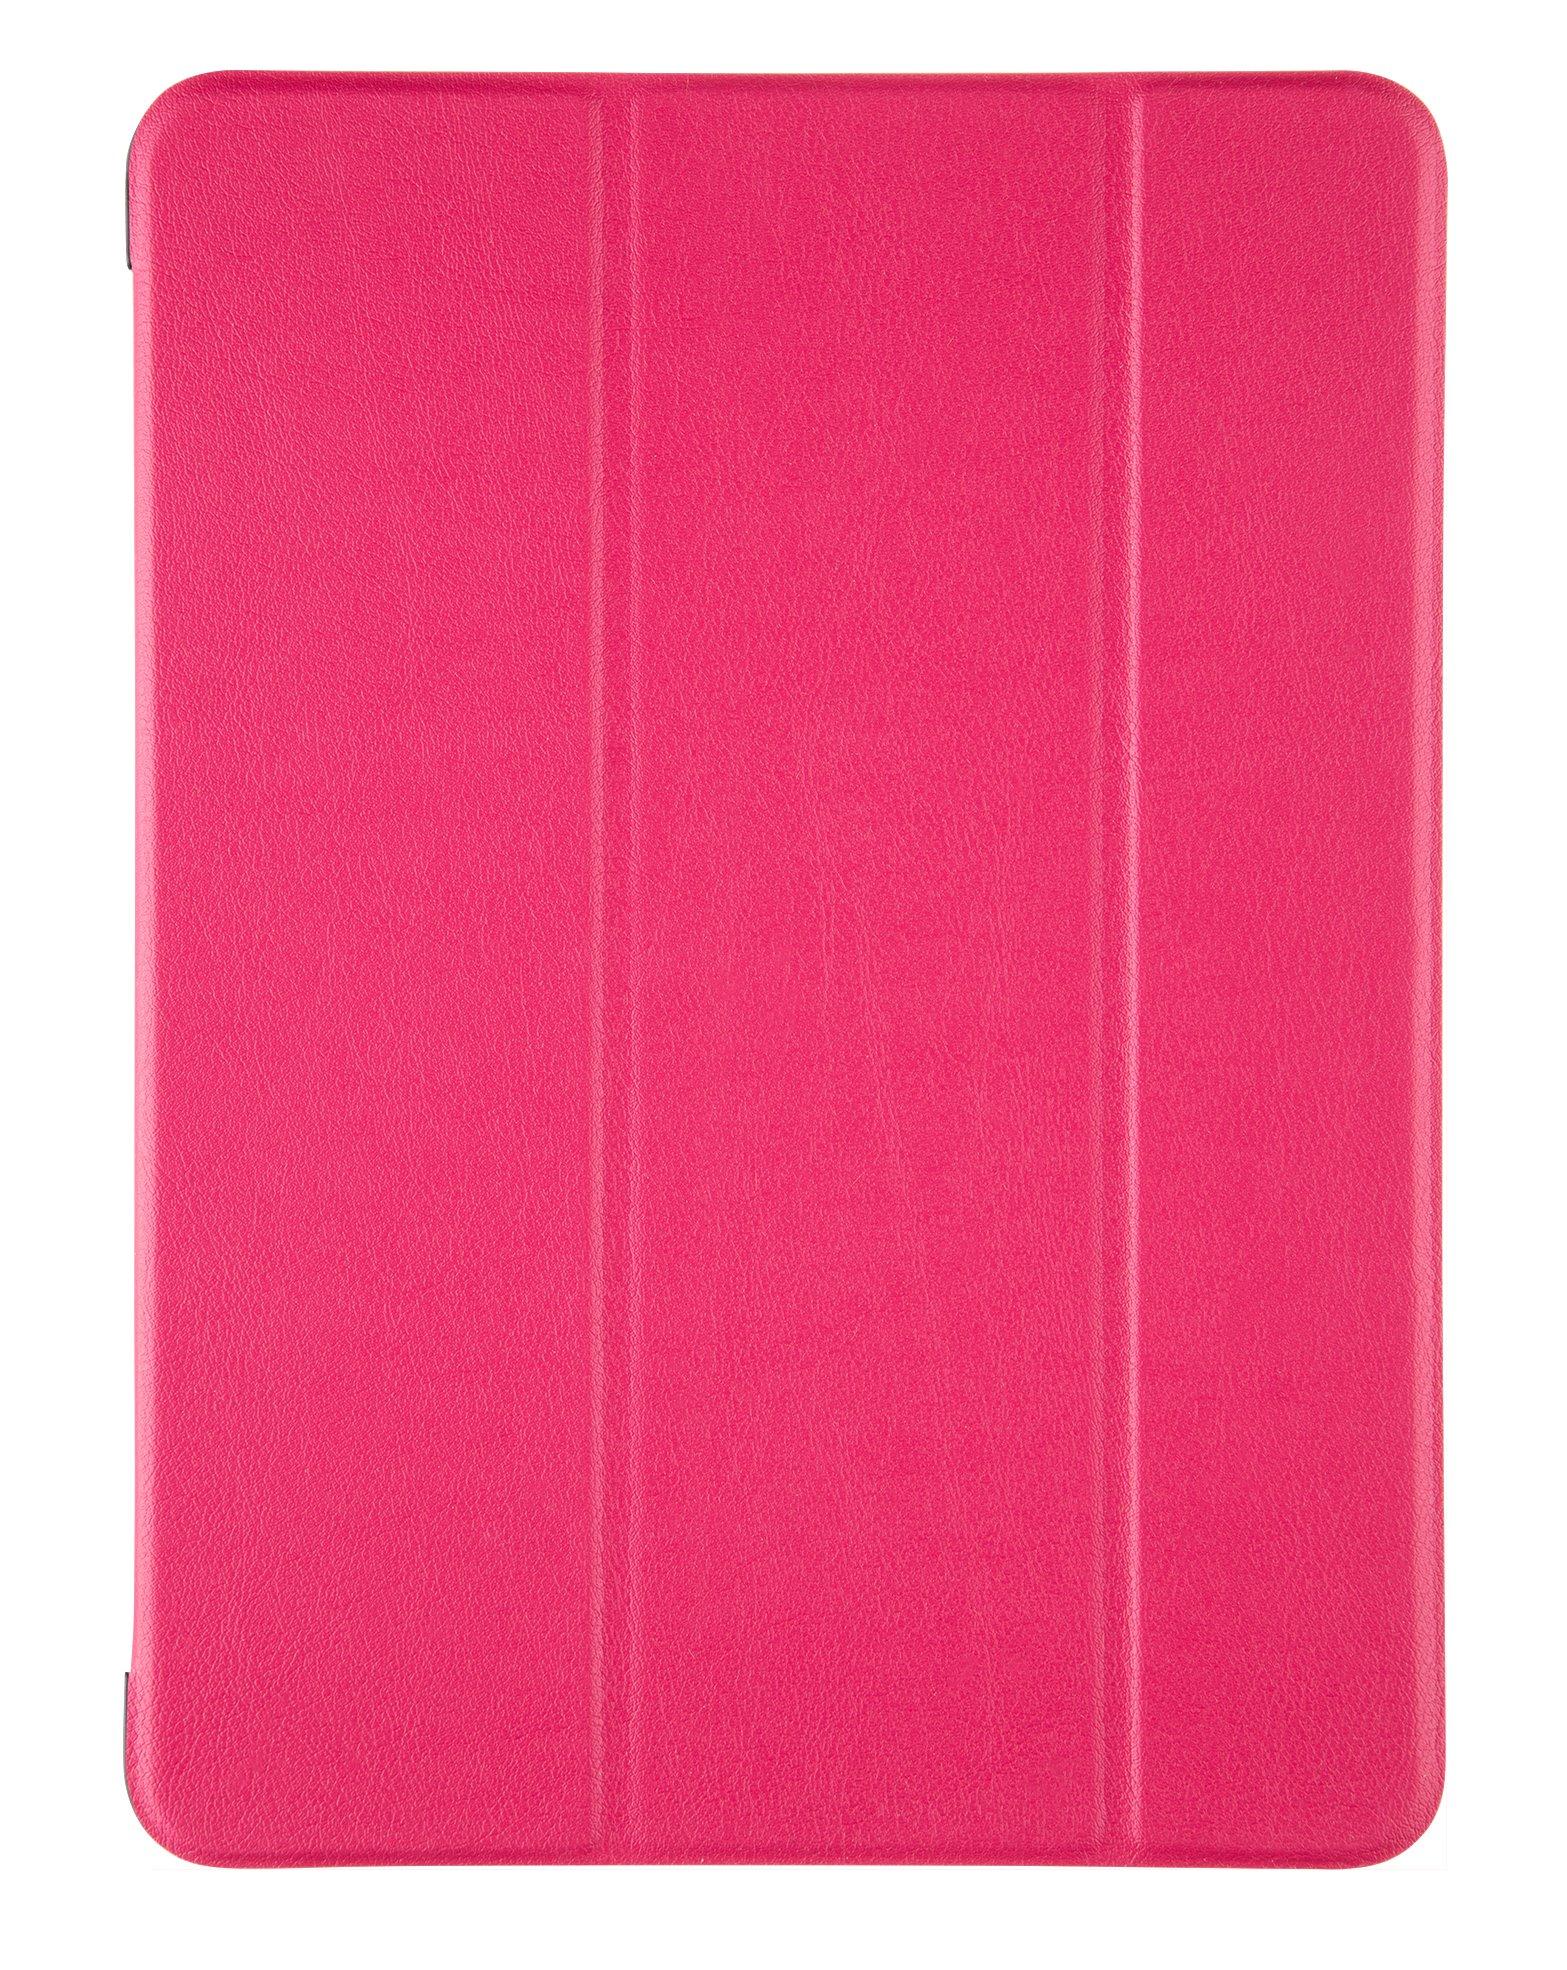 Tactical Book Tri Fold Pouzdro pro Samsung T220/T225 Galaxy Tab A7 Lite 8.7 Pink 8596311153341